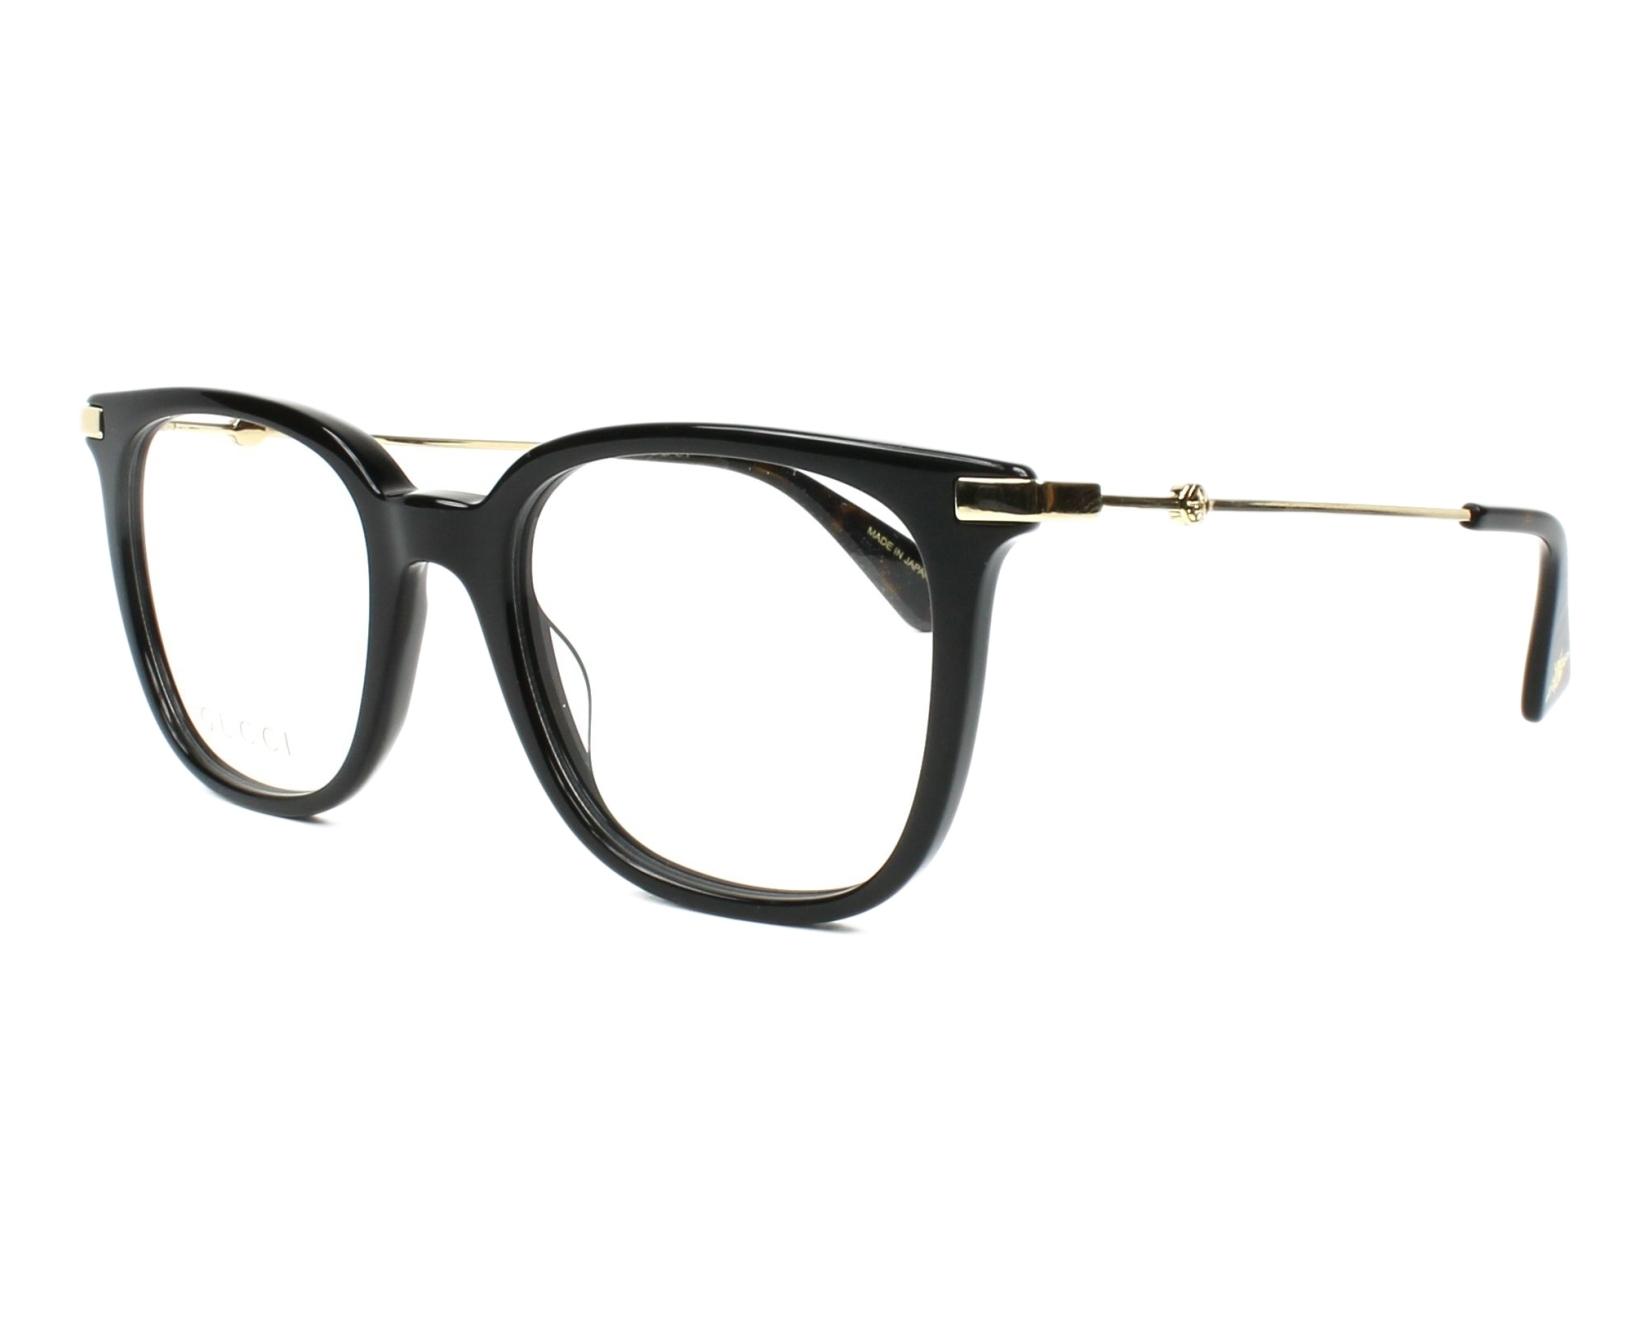 lunettes de vue gucci gg 01100 001 noir. Black Bedroom Furniture Sets. Home Design Ideas